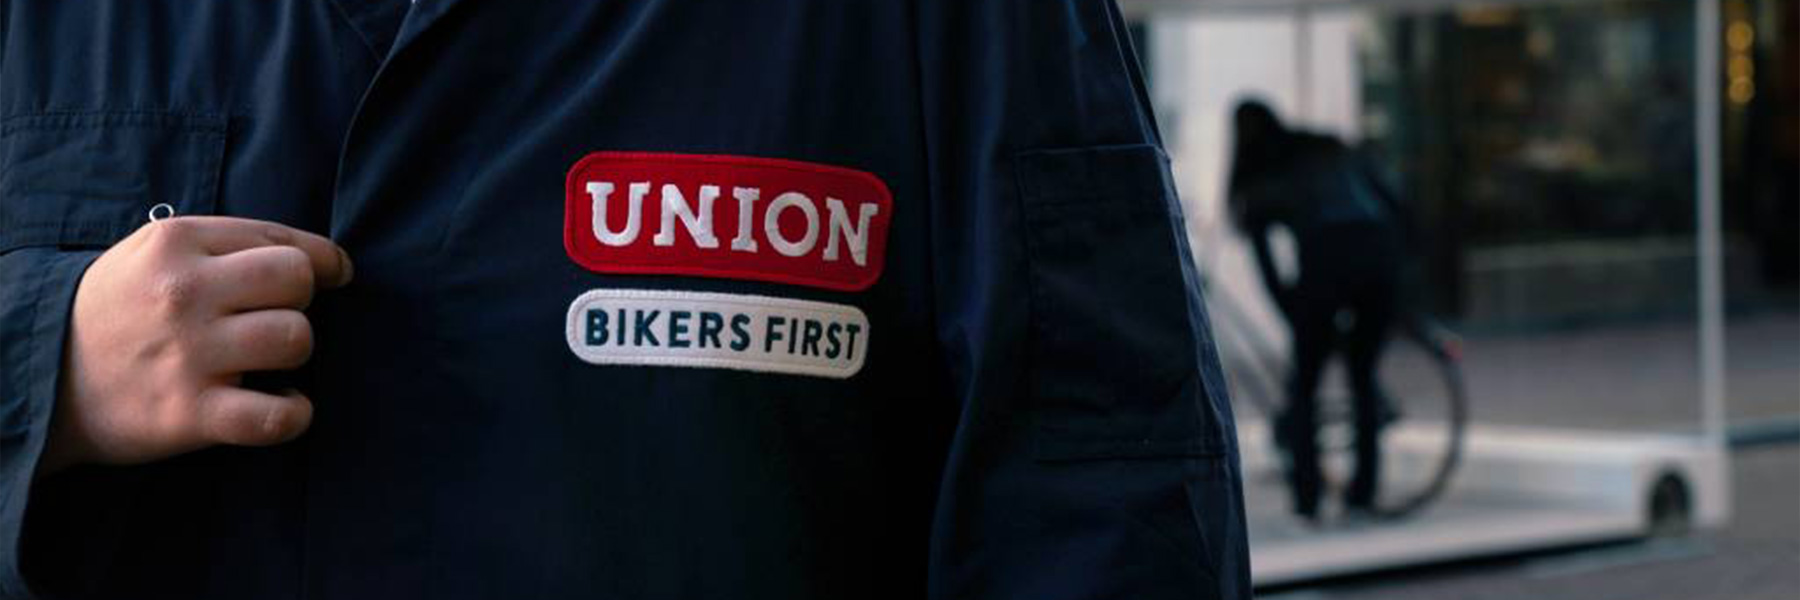 Union bikers first pak